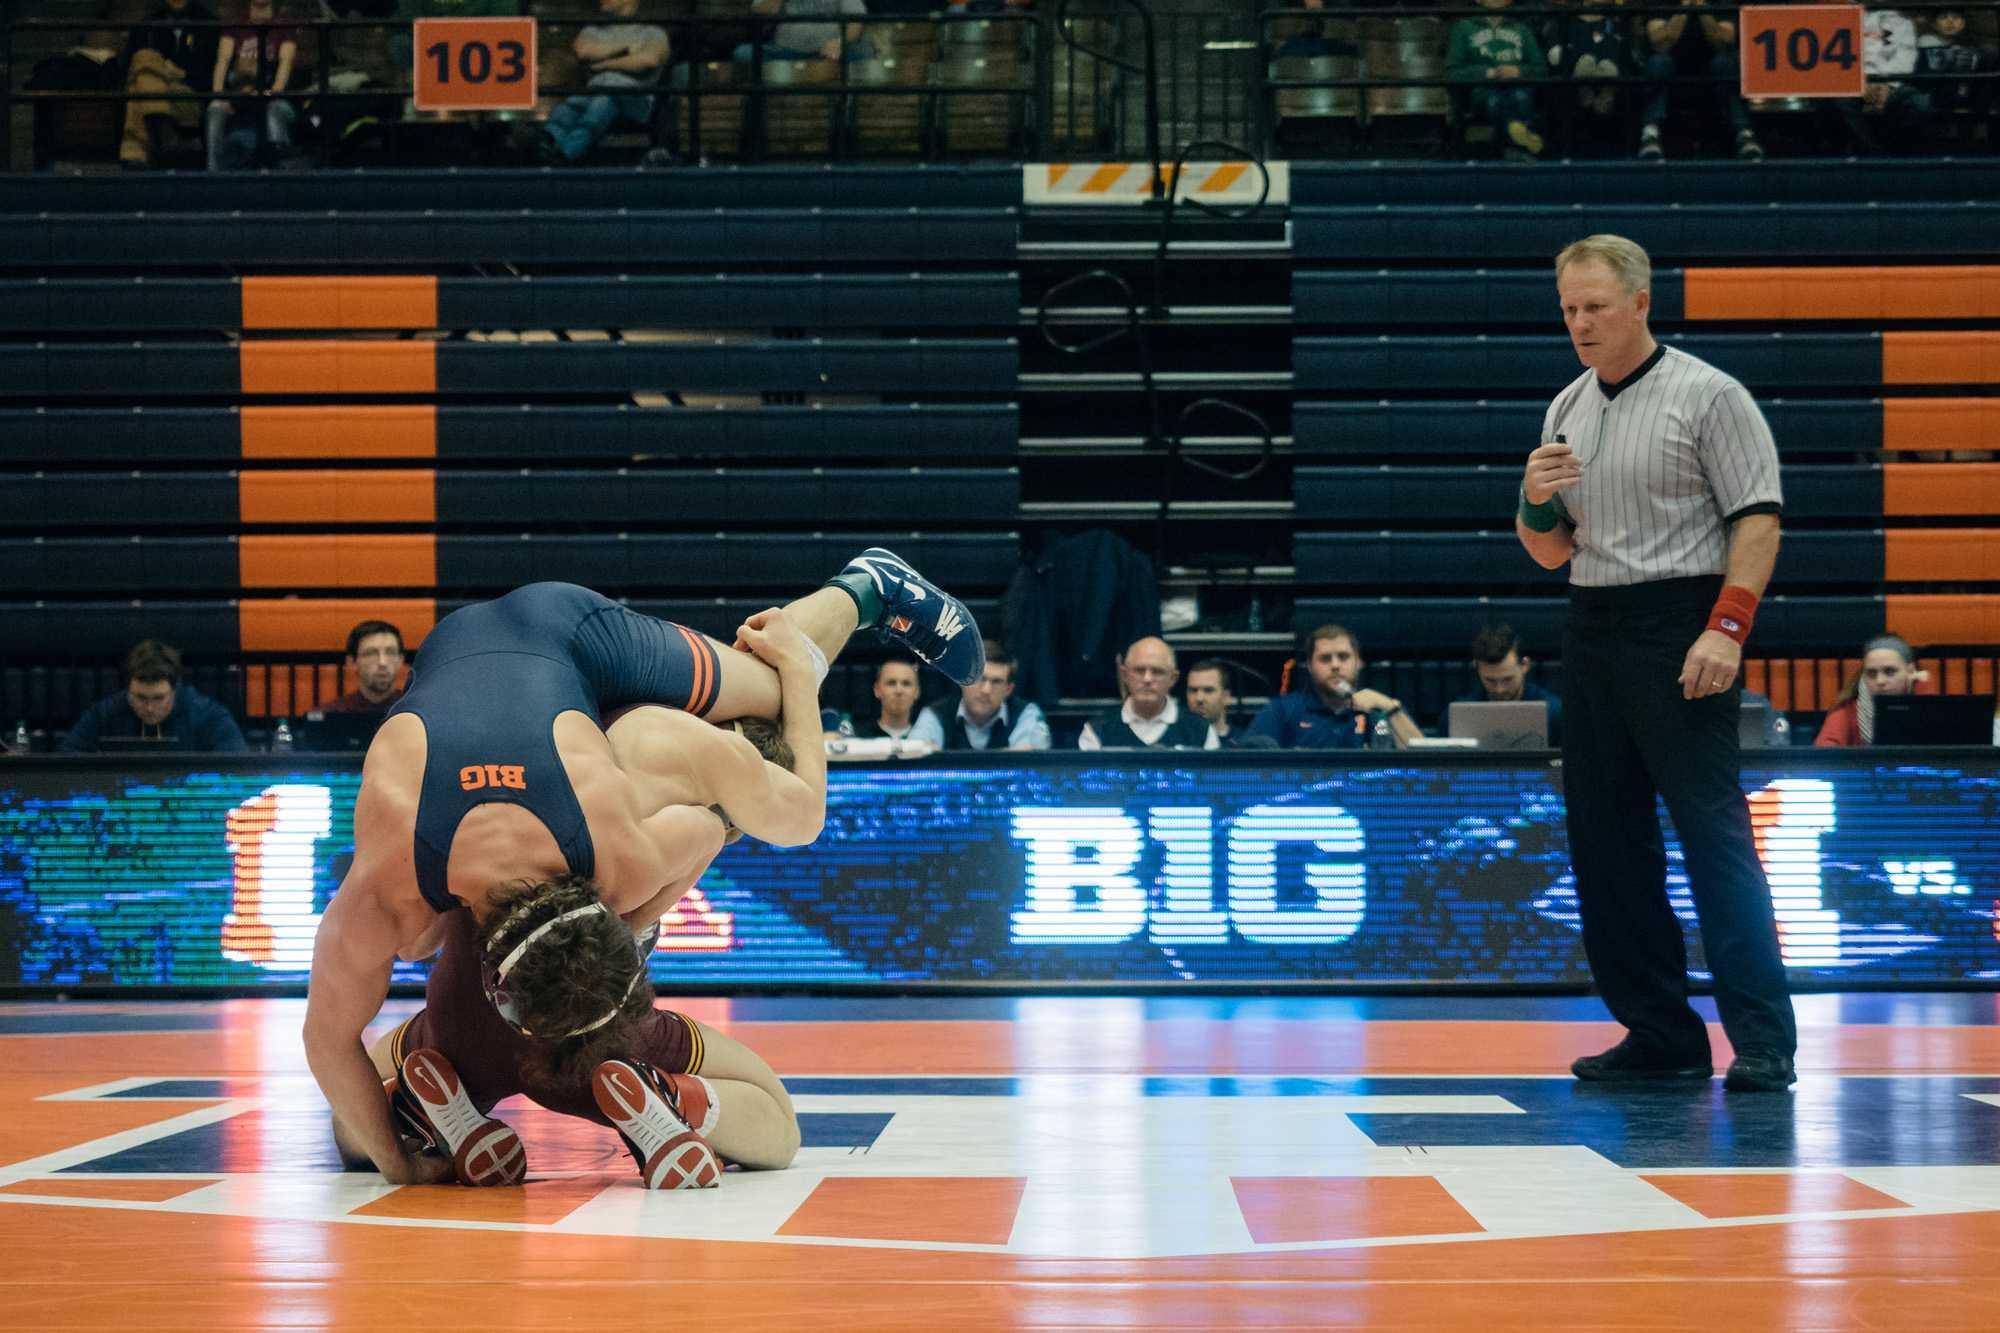 Illinois+wrestler+Zane+Richards+looks+to+add+a+Big+Ten+Championship+to+his+resume.